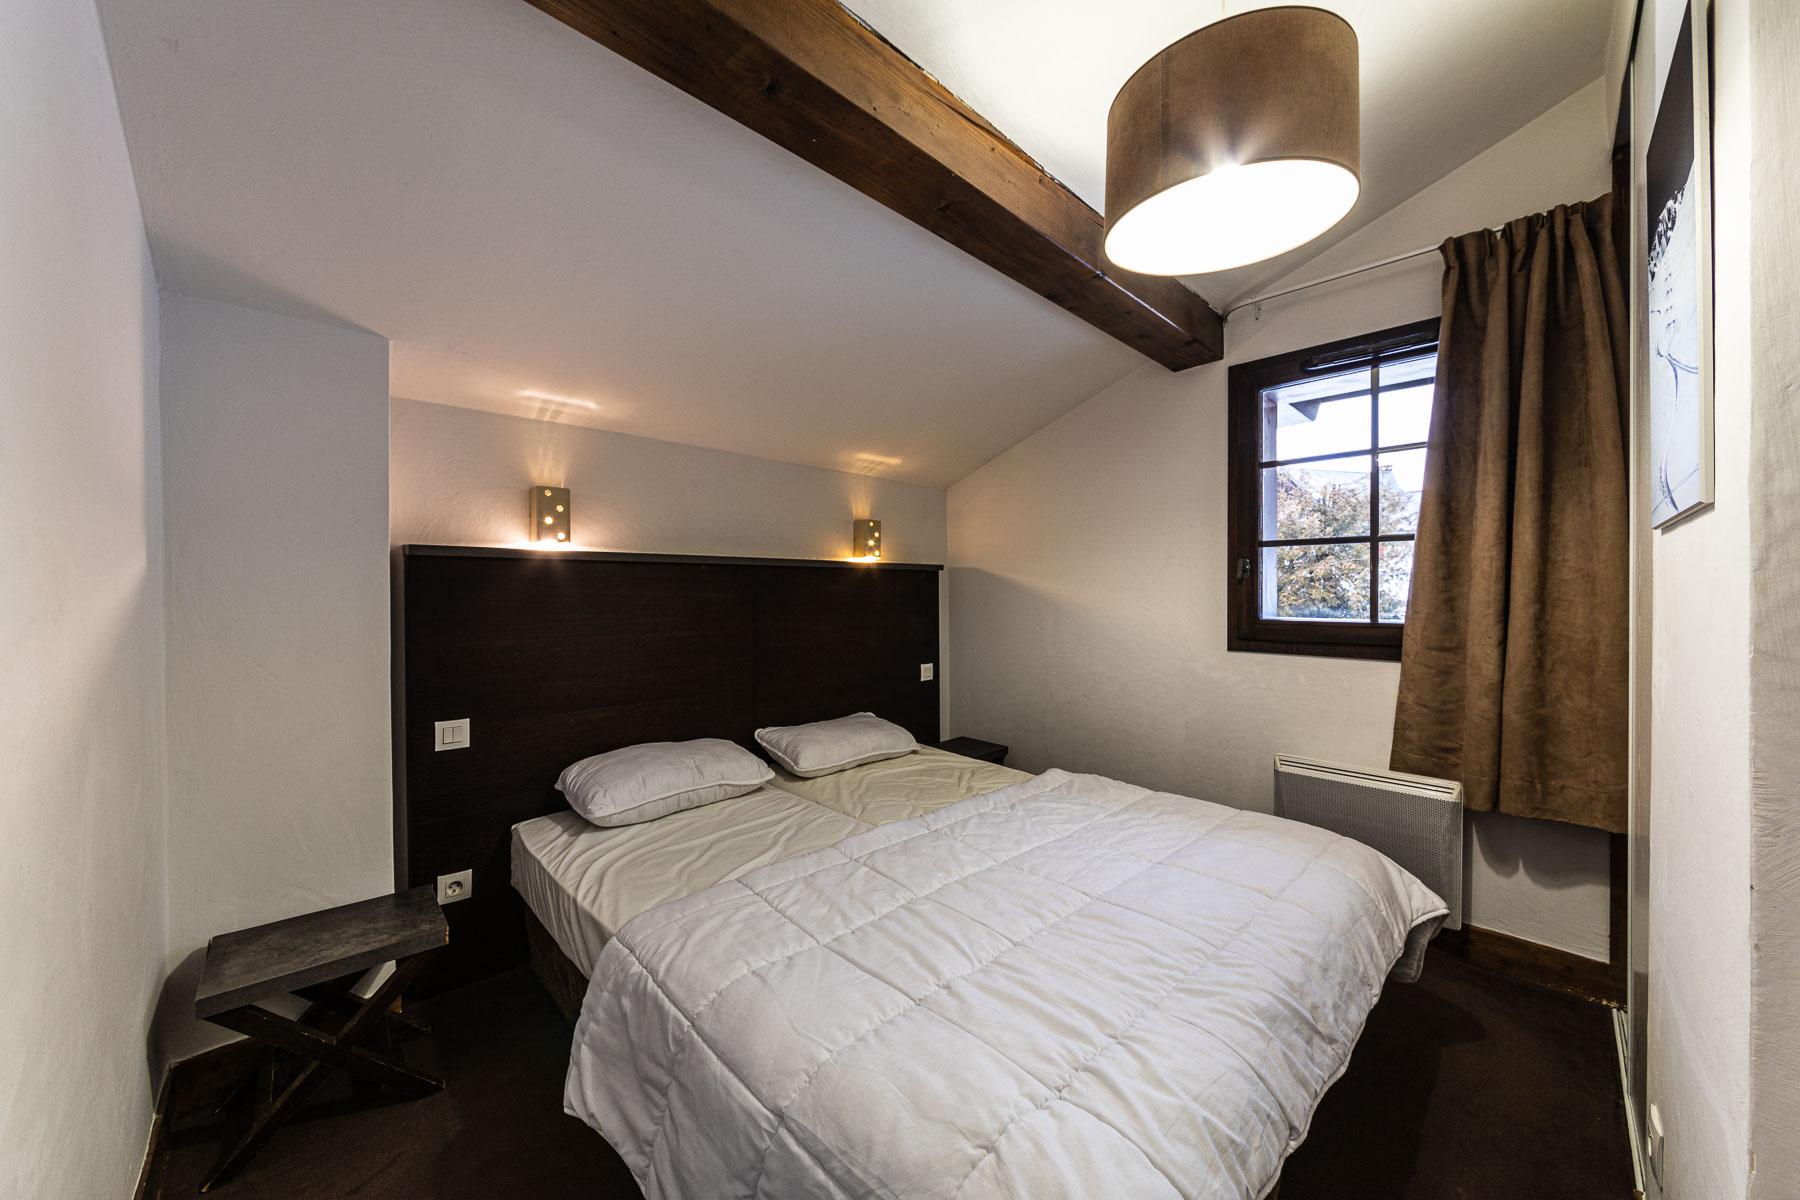 Ferme Emiguy Chalet 6 Guest Bedroom